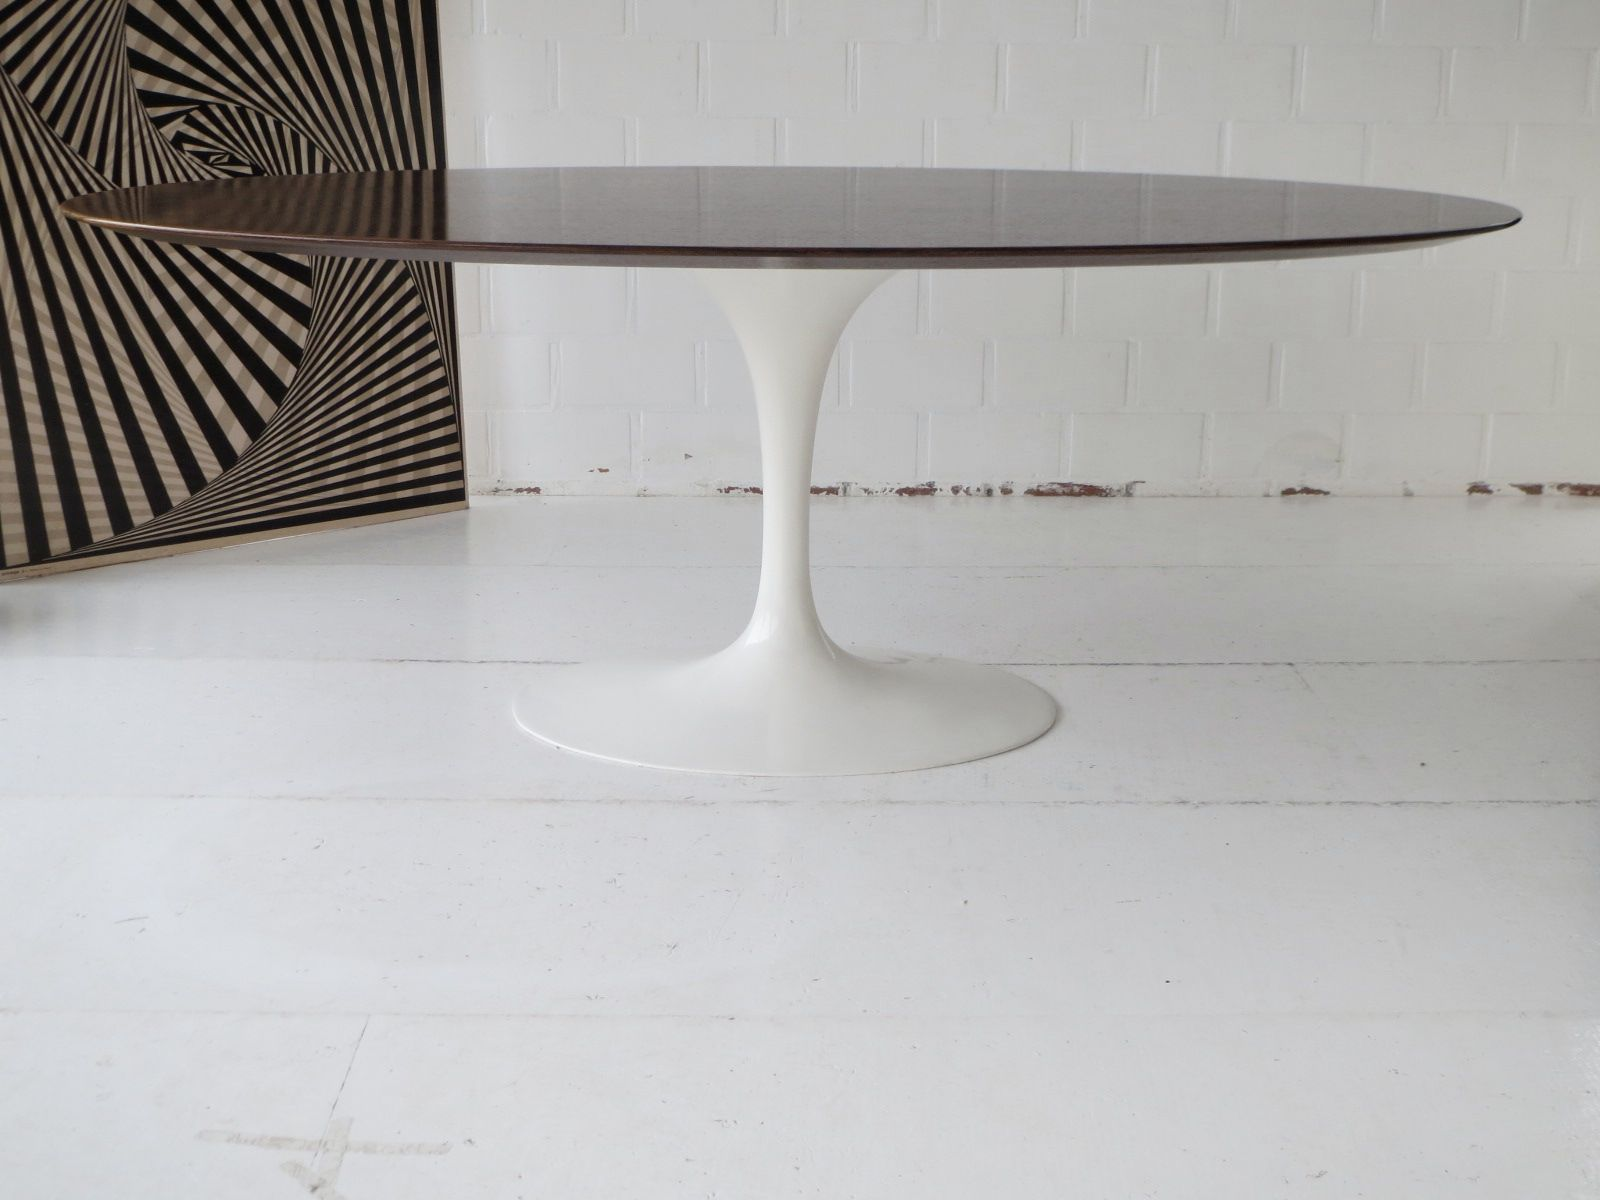 Table de salle manger tulipe ovale en palissandre de rio for Table de salle a manger knoll